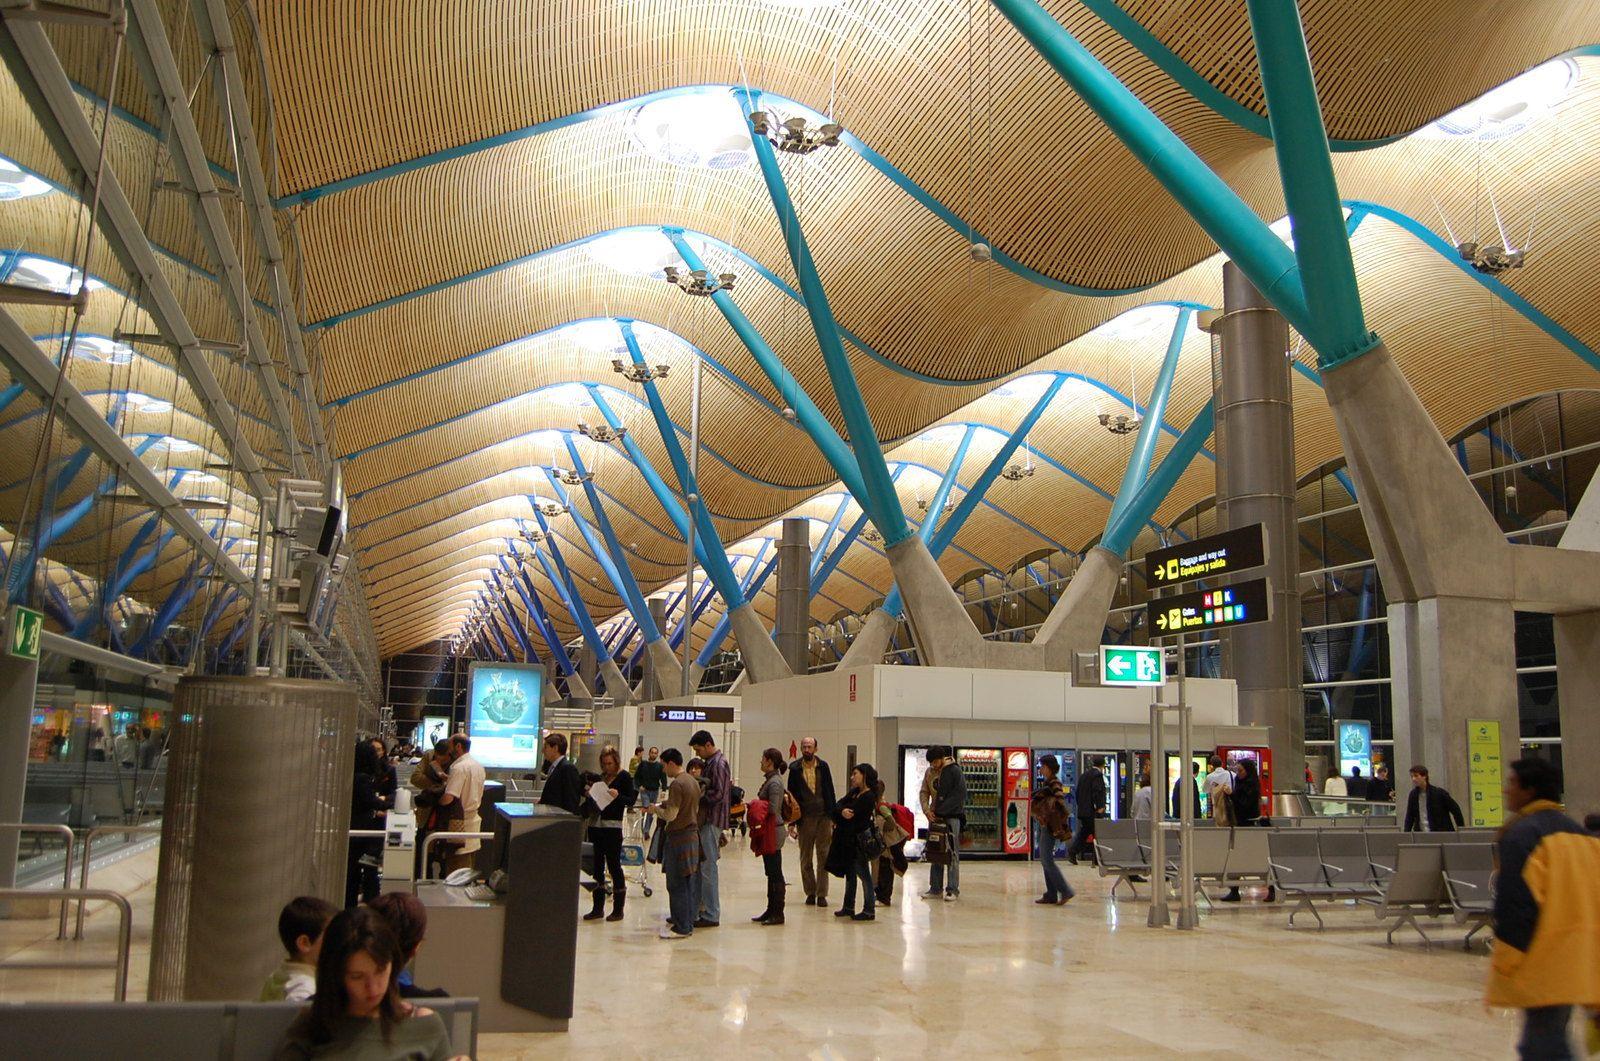 Richard Rogers - Aéroport de Barajas Madrid - Photos: Lankaart (c)